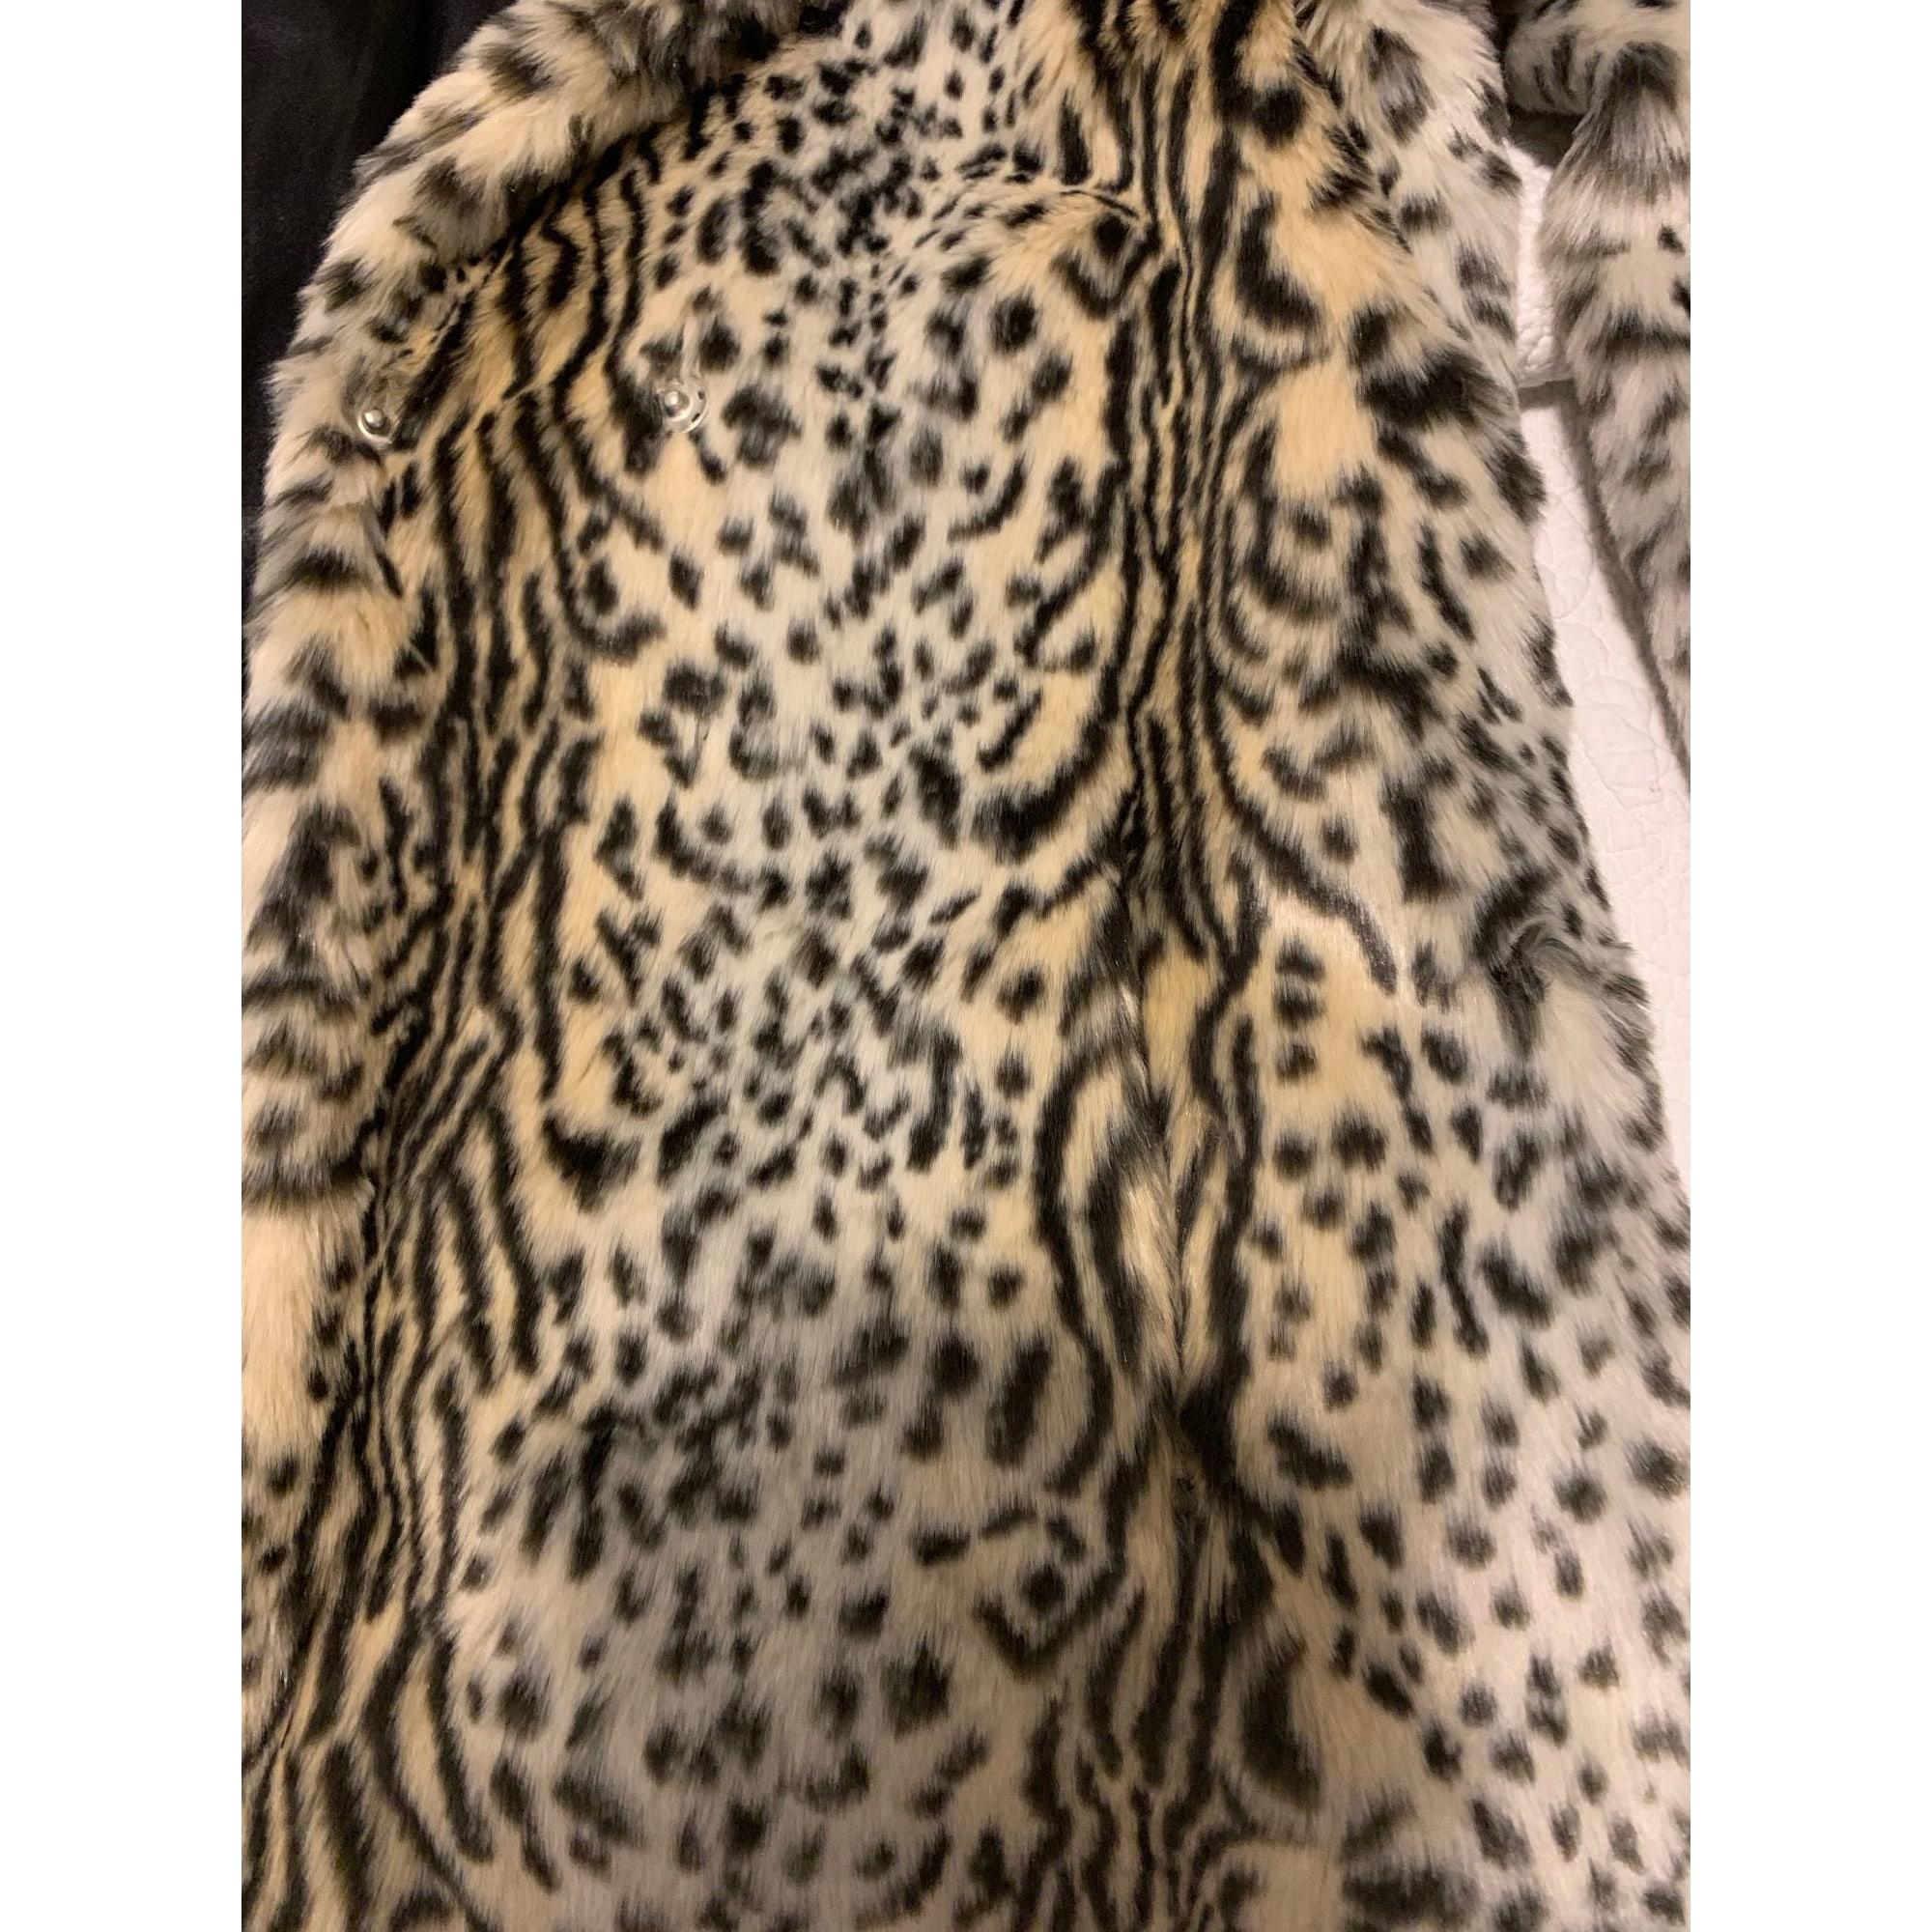 Manteau en fourrure NEW LOOK Imprimés animaliers